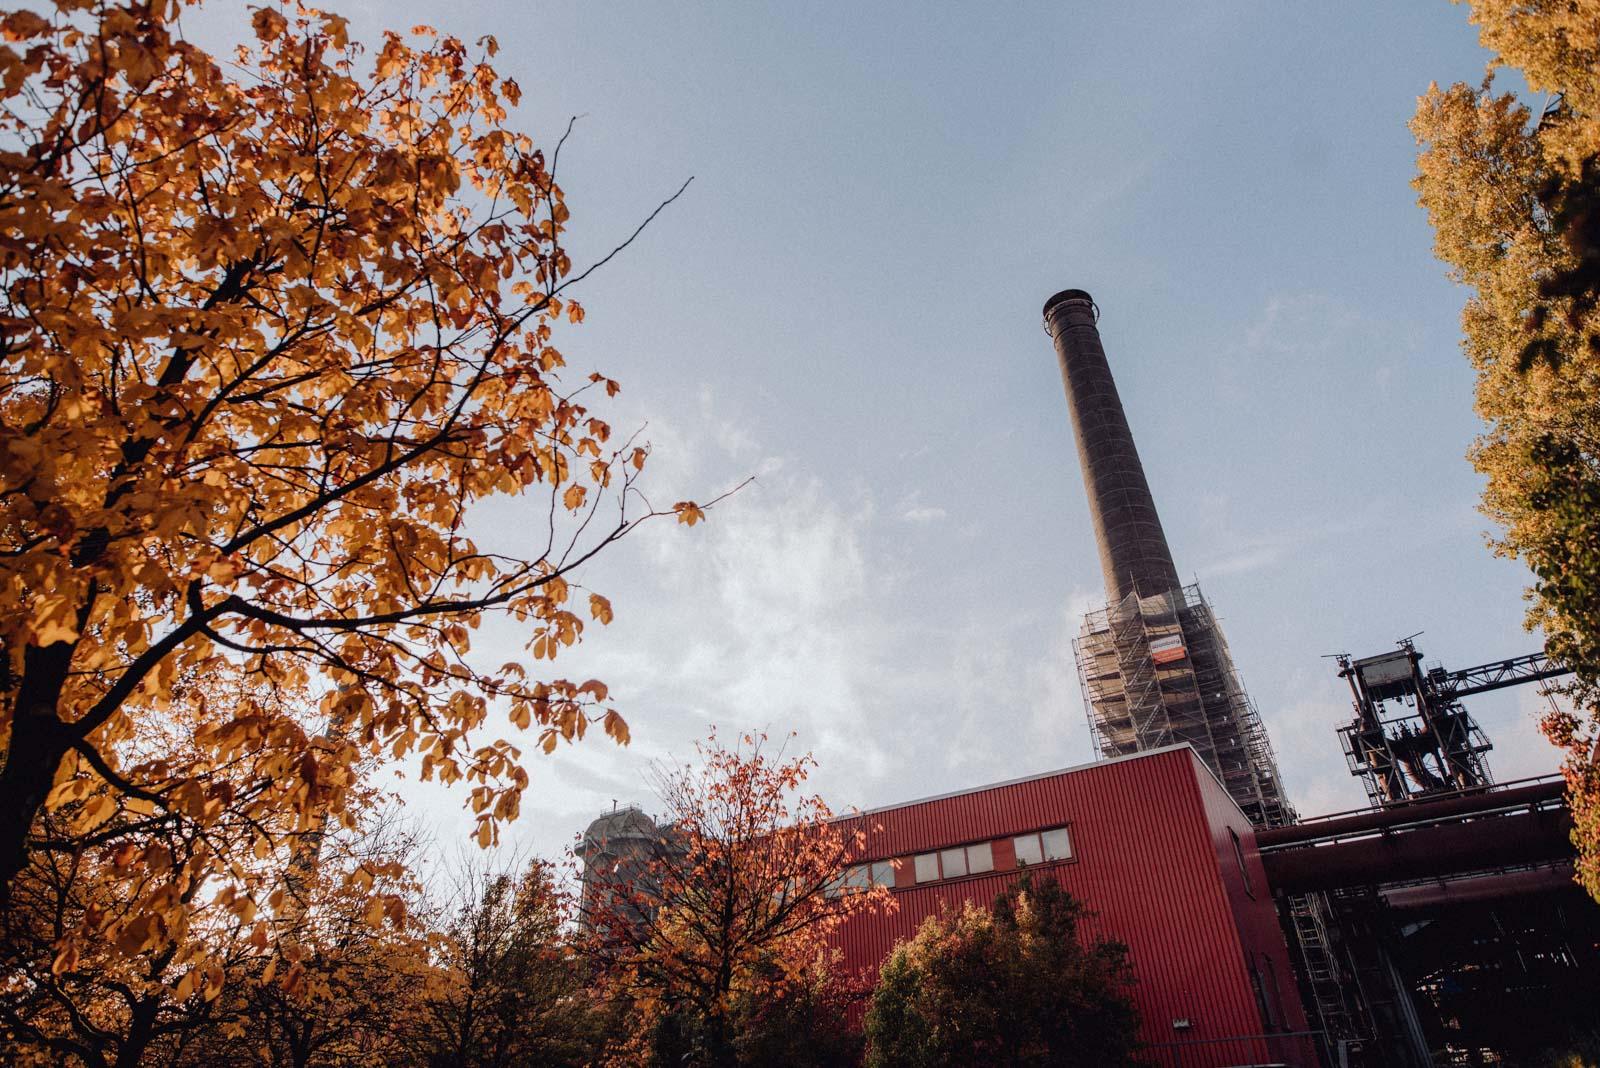 001-Babybauch-Shooting-Paarshooting-LaPaDu-Fotograf-Ruhrgebiet-Industriegebiet